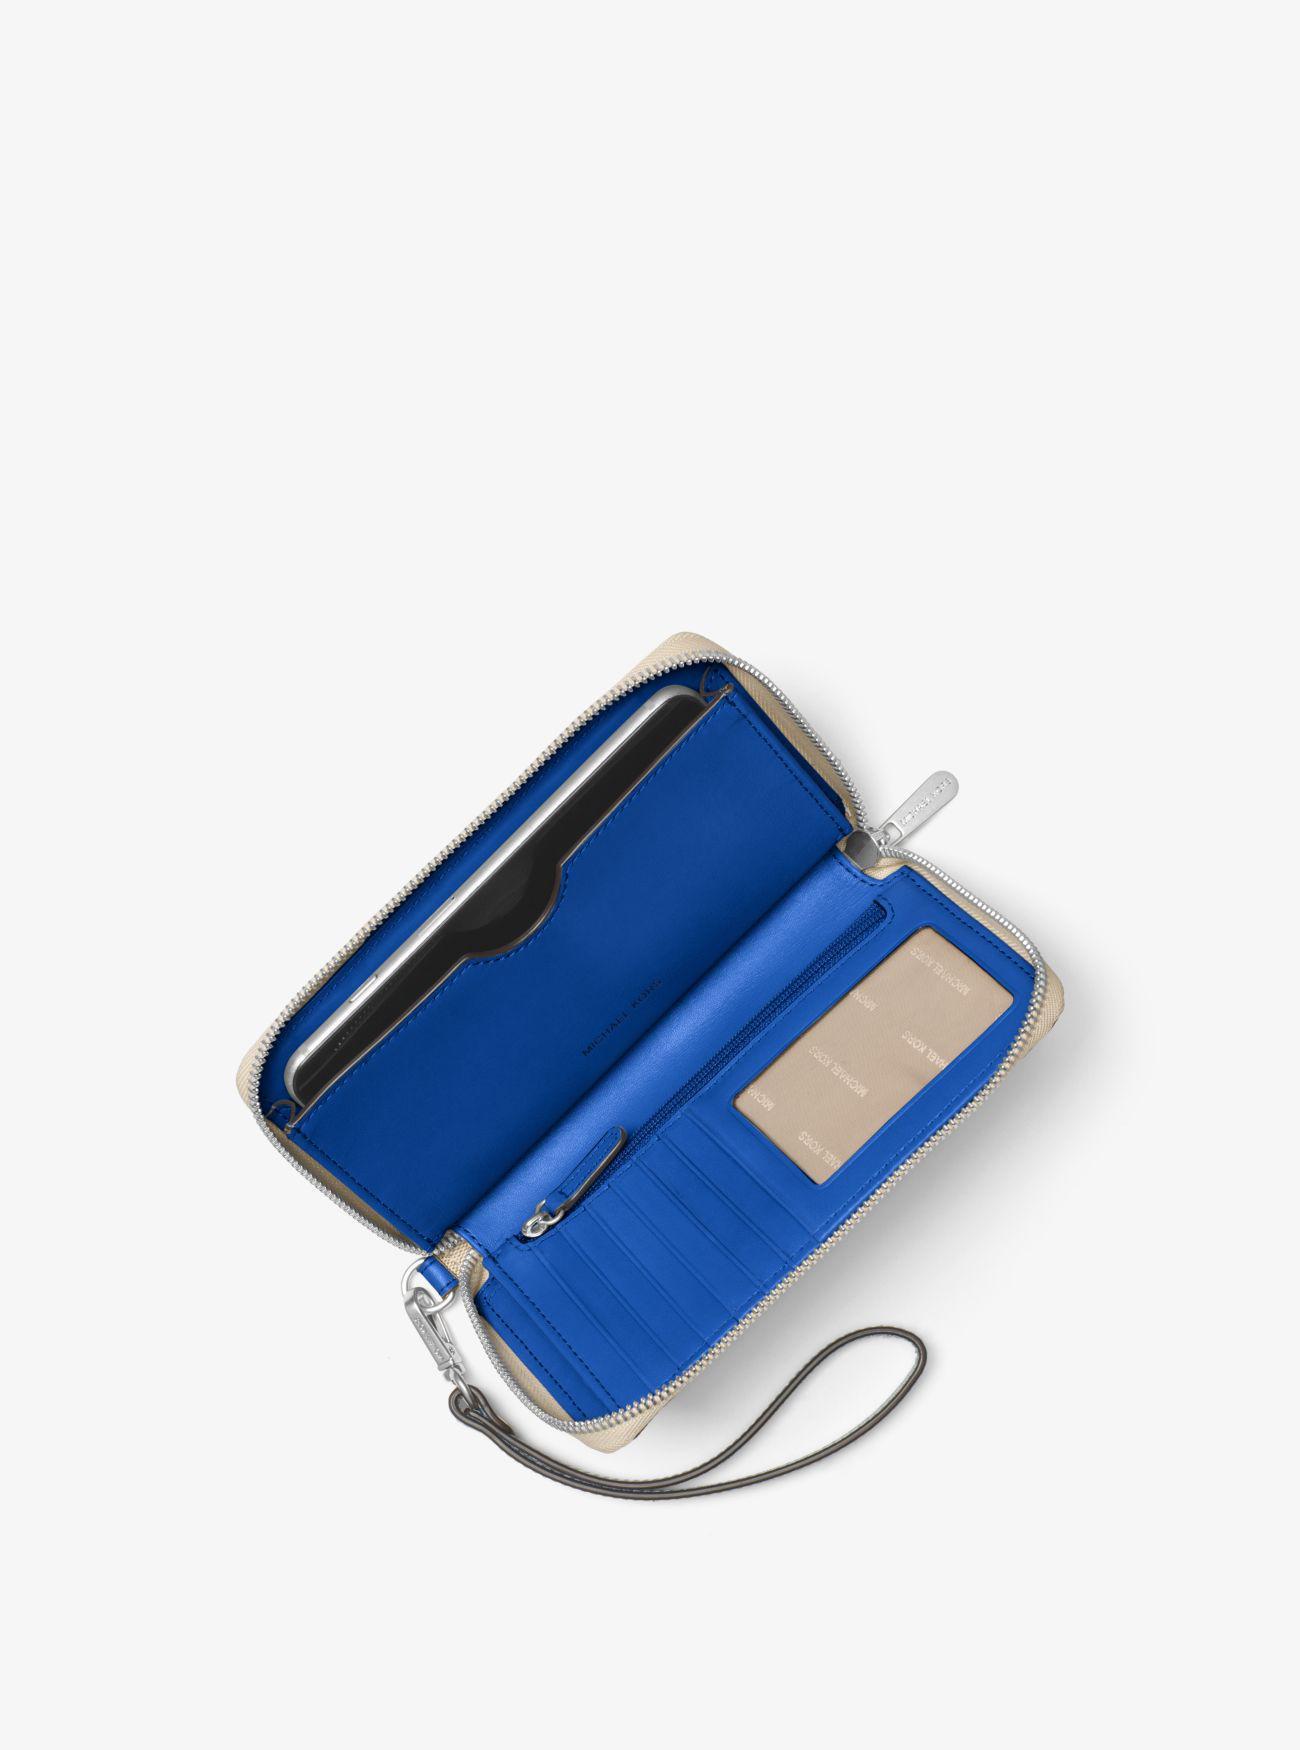 15a67c4417d3 Lyst - Michael Kors Jet Set Travel Large Logo Wallet in Blue